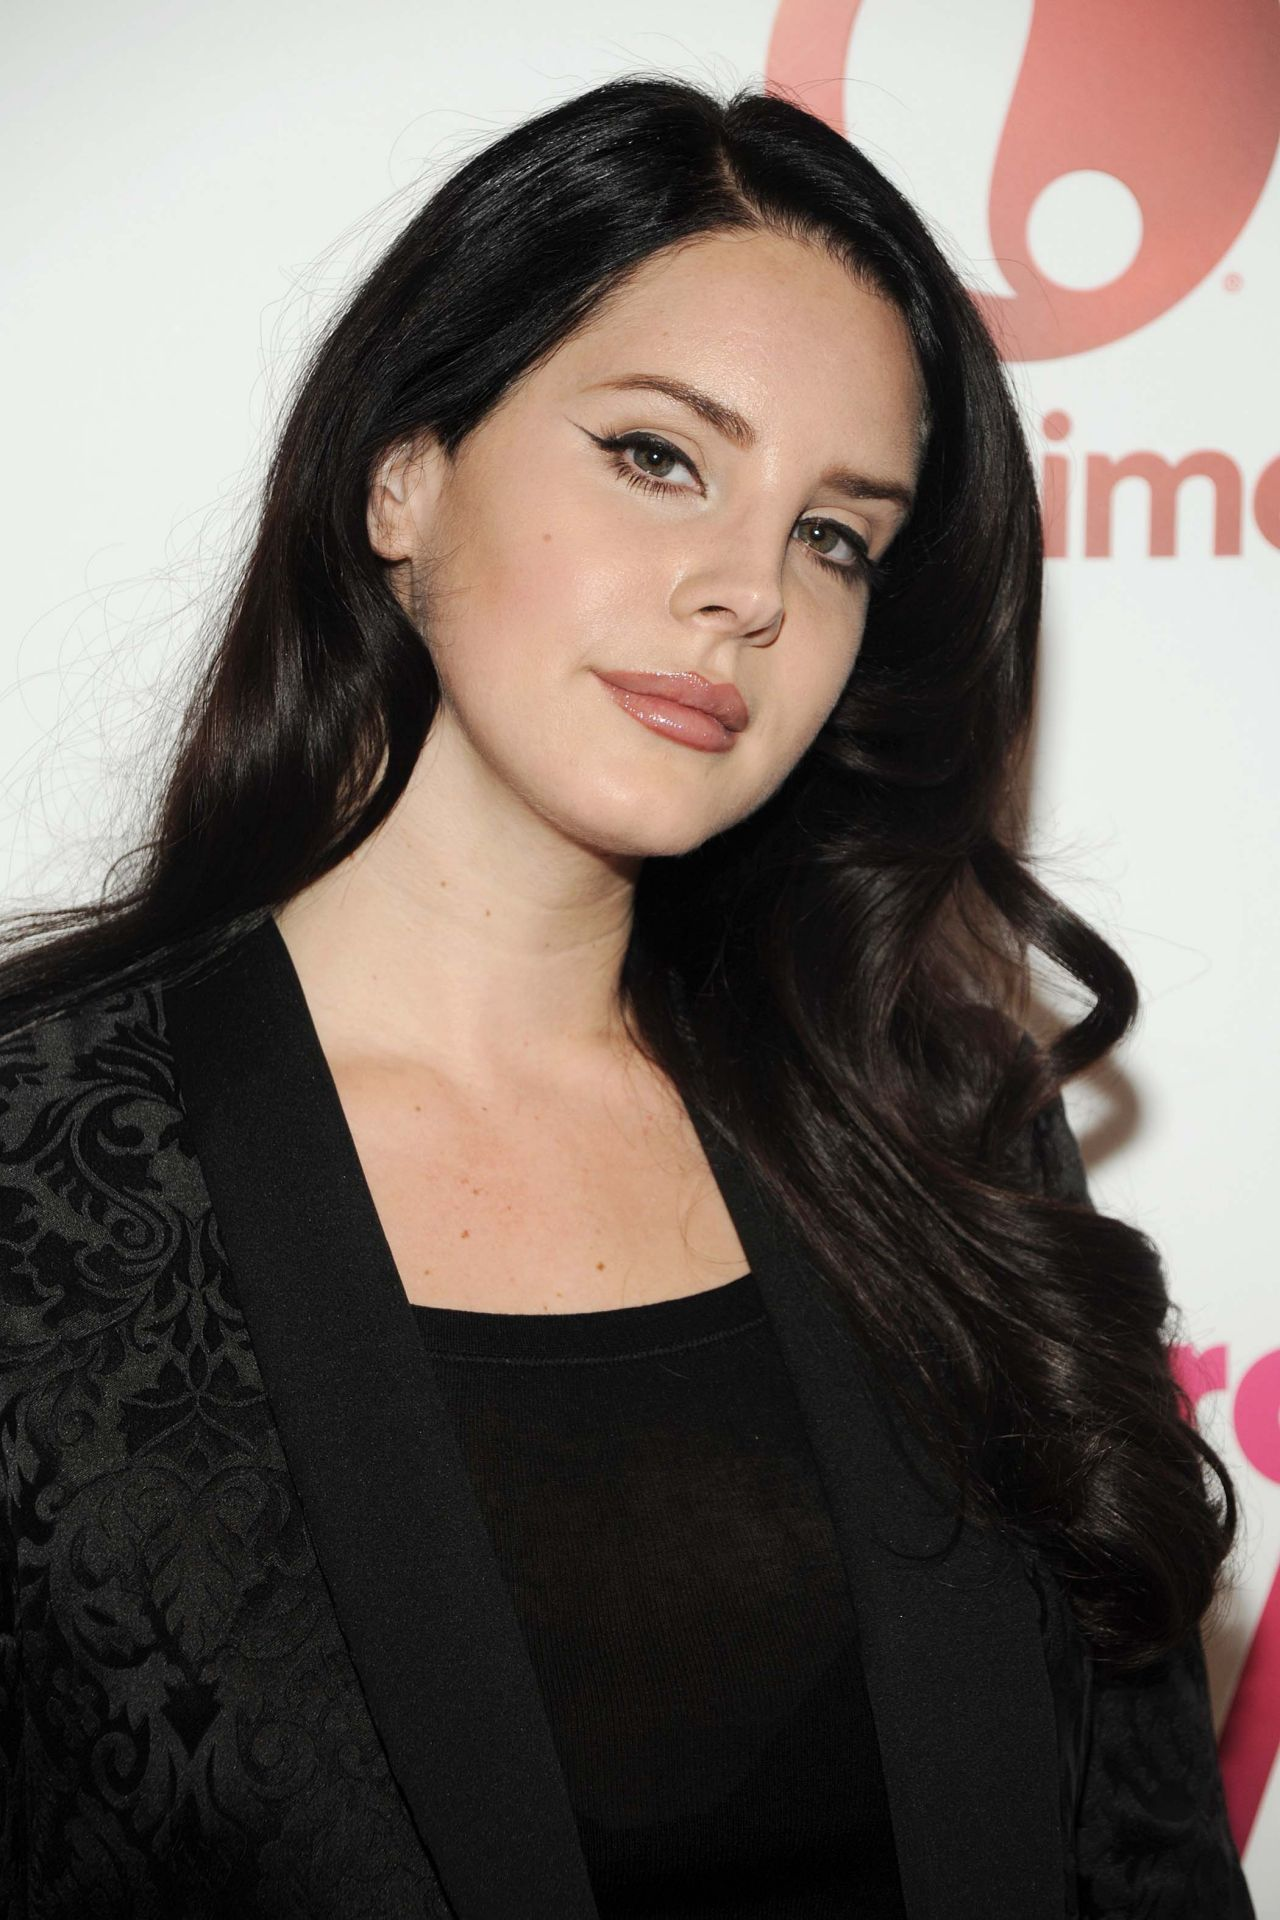 Lana Del Rey By Chris Nicholls For Fashion Magazine: 2015 Billboard Women In Music Event In New